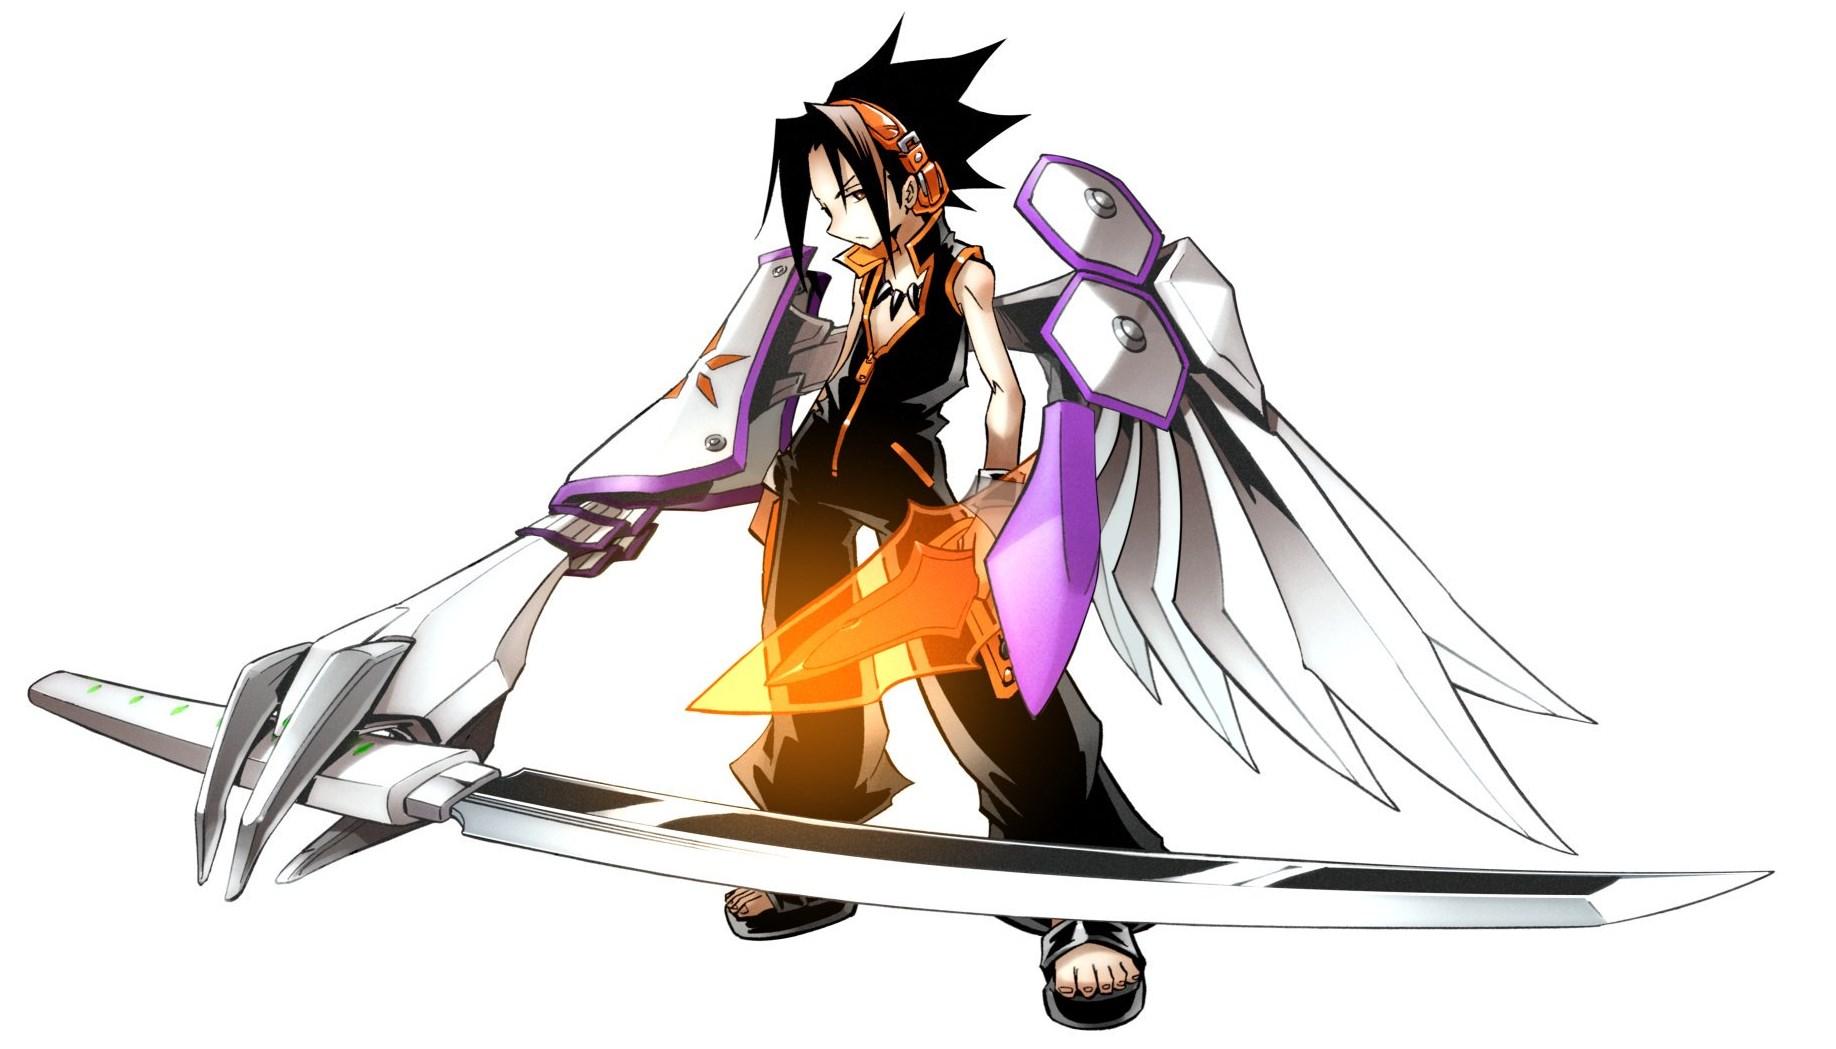 Glavni junaci crtanih filmova O.S._Spirit_of_Sword_White_Swan